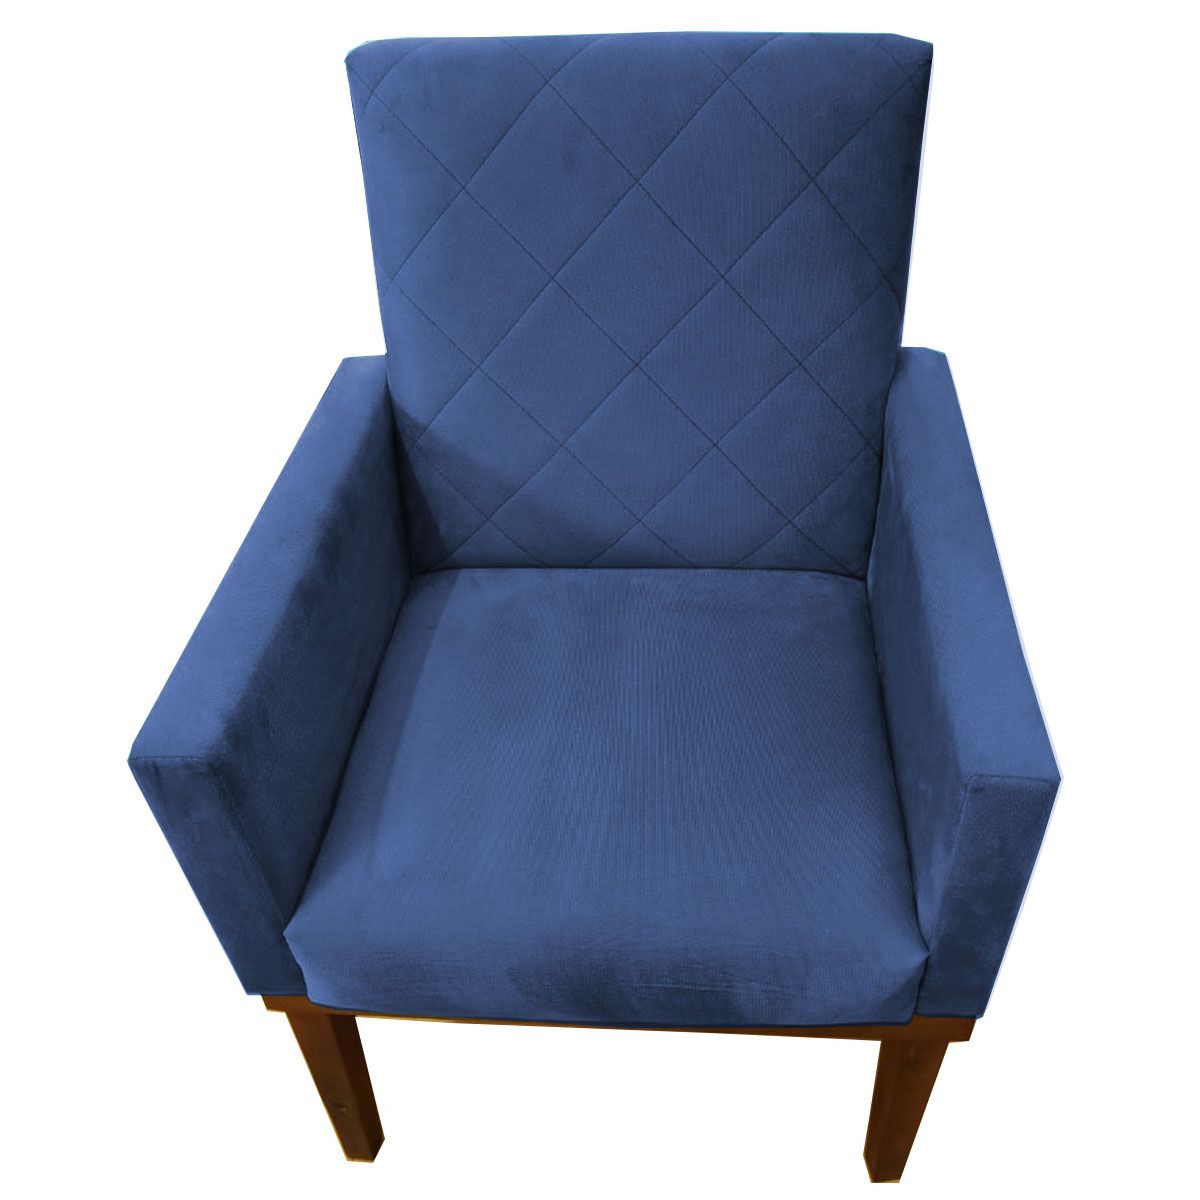 Poltrona Decorativa Beatriz Base Madeira Tecido Azul Marinho